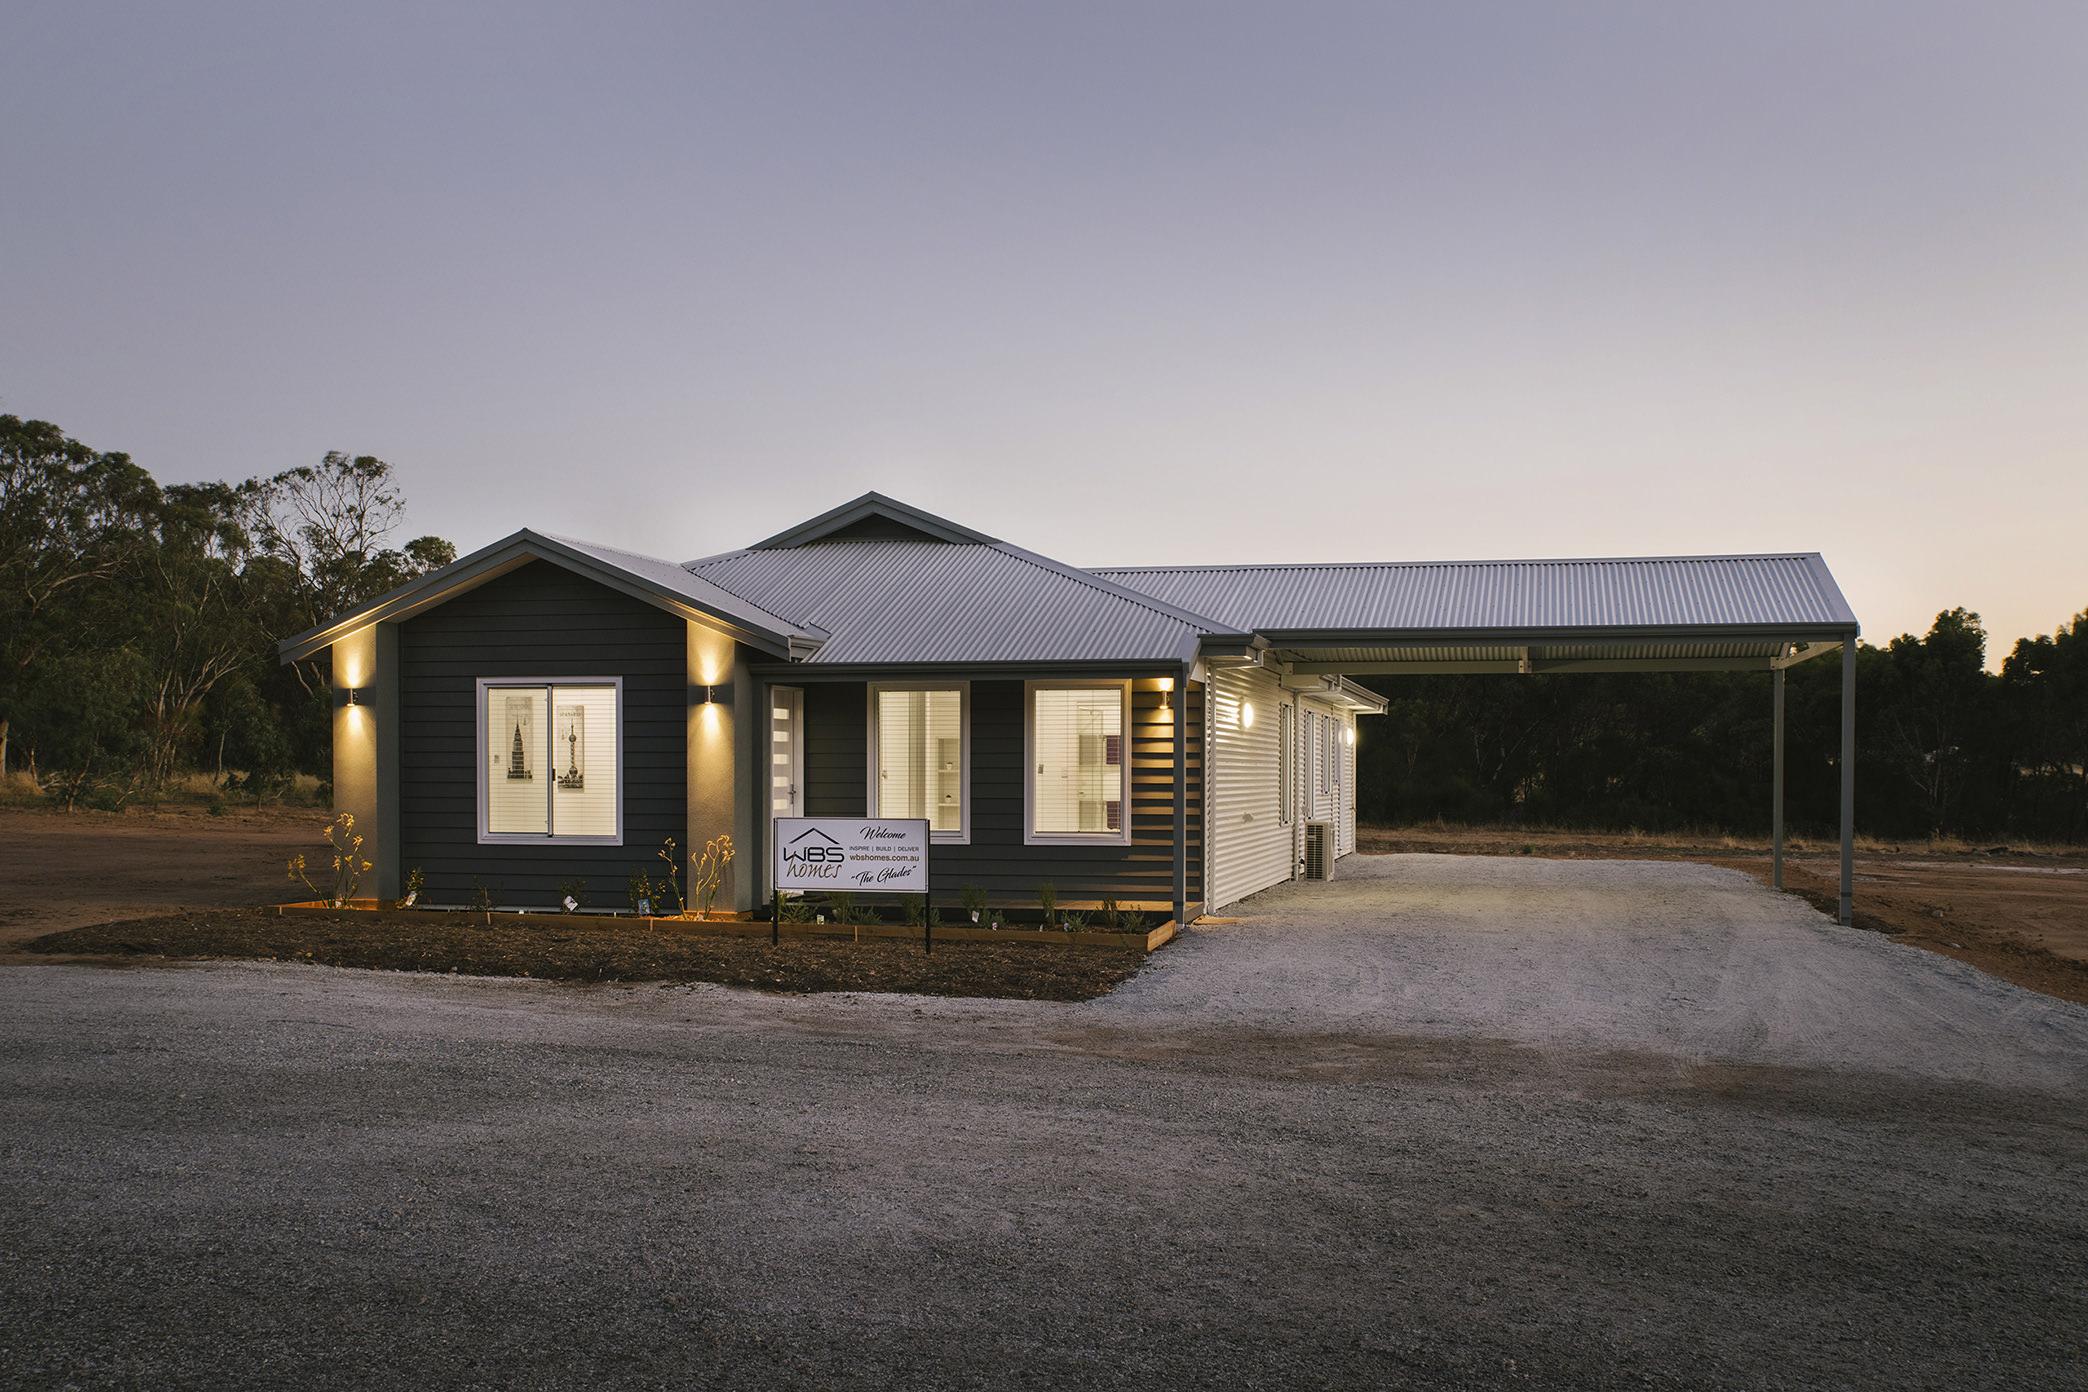 Evoke Modular Home Display with Carport